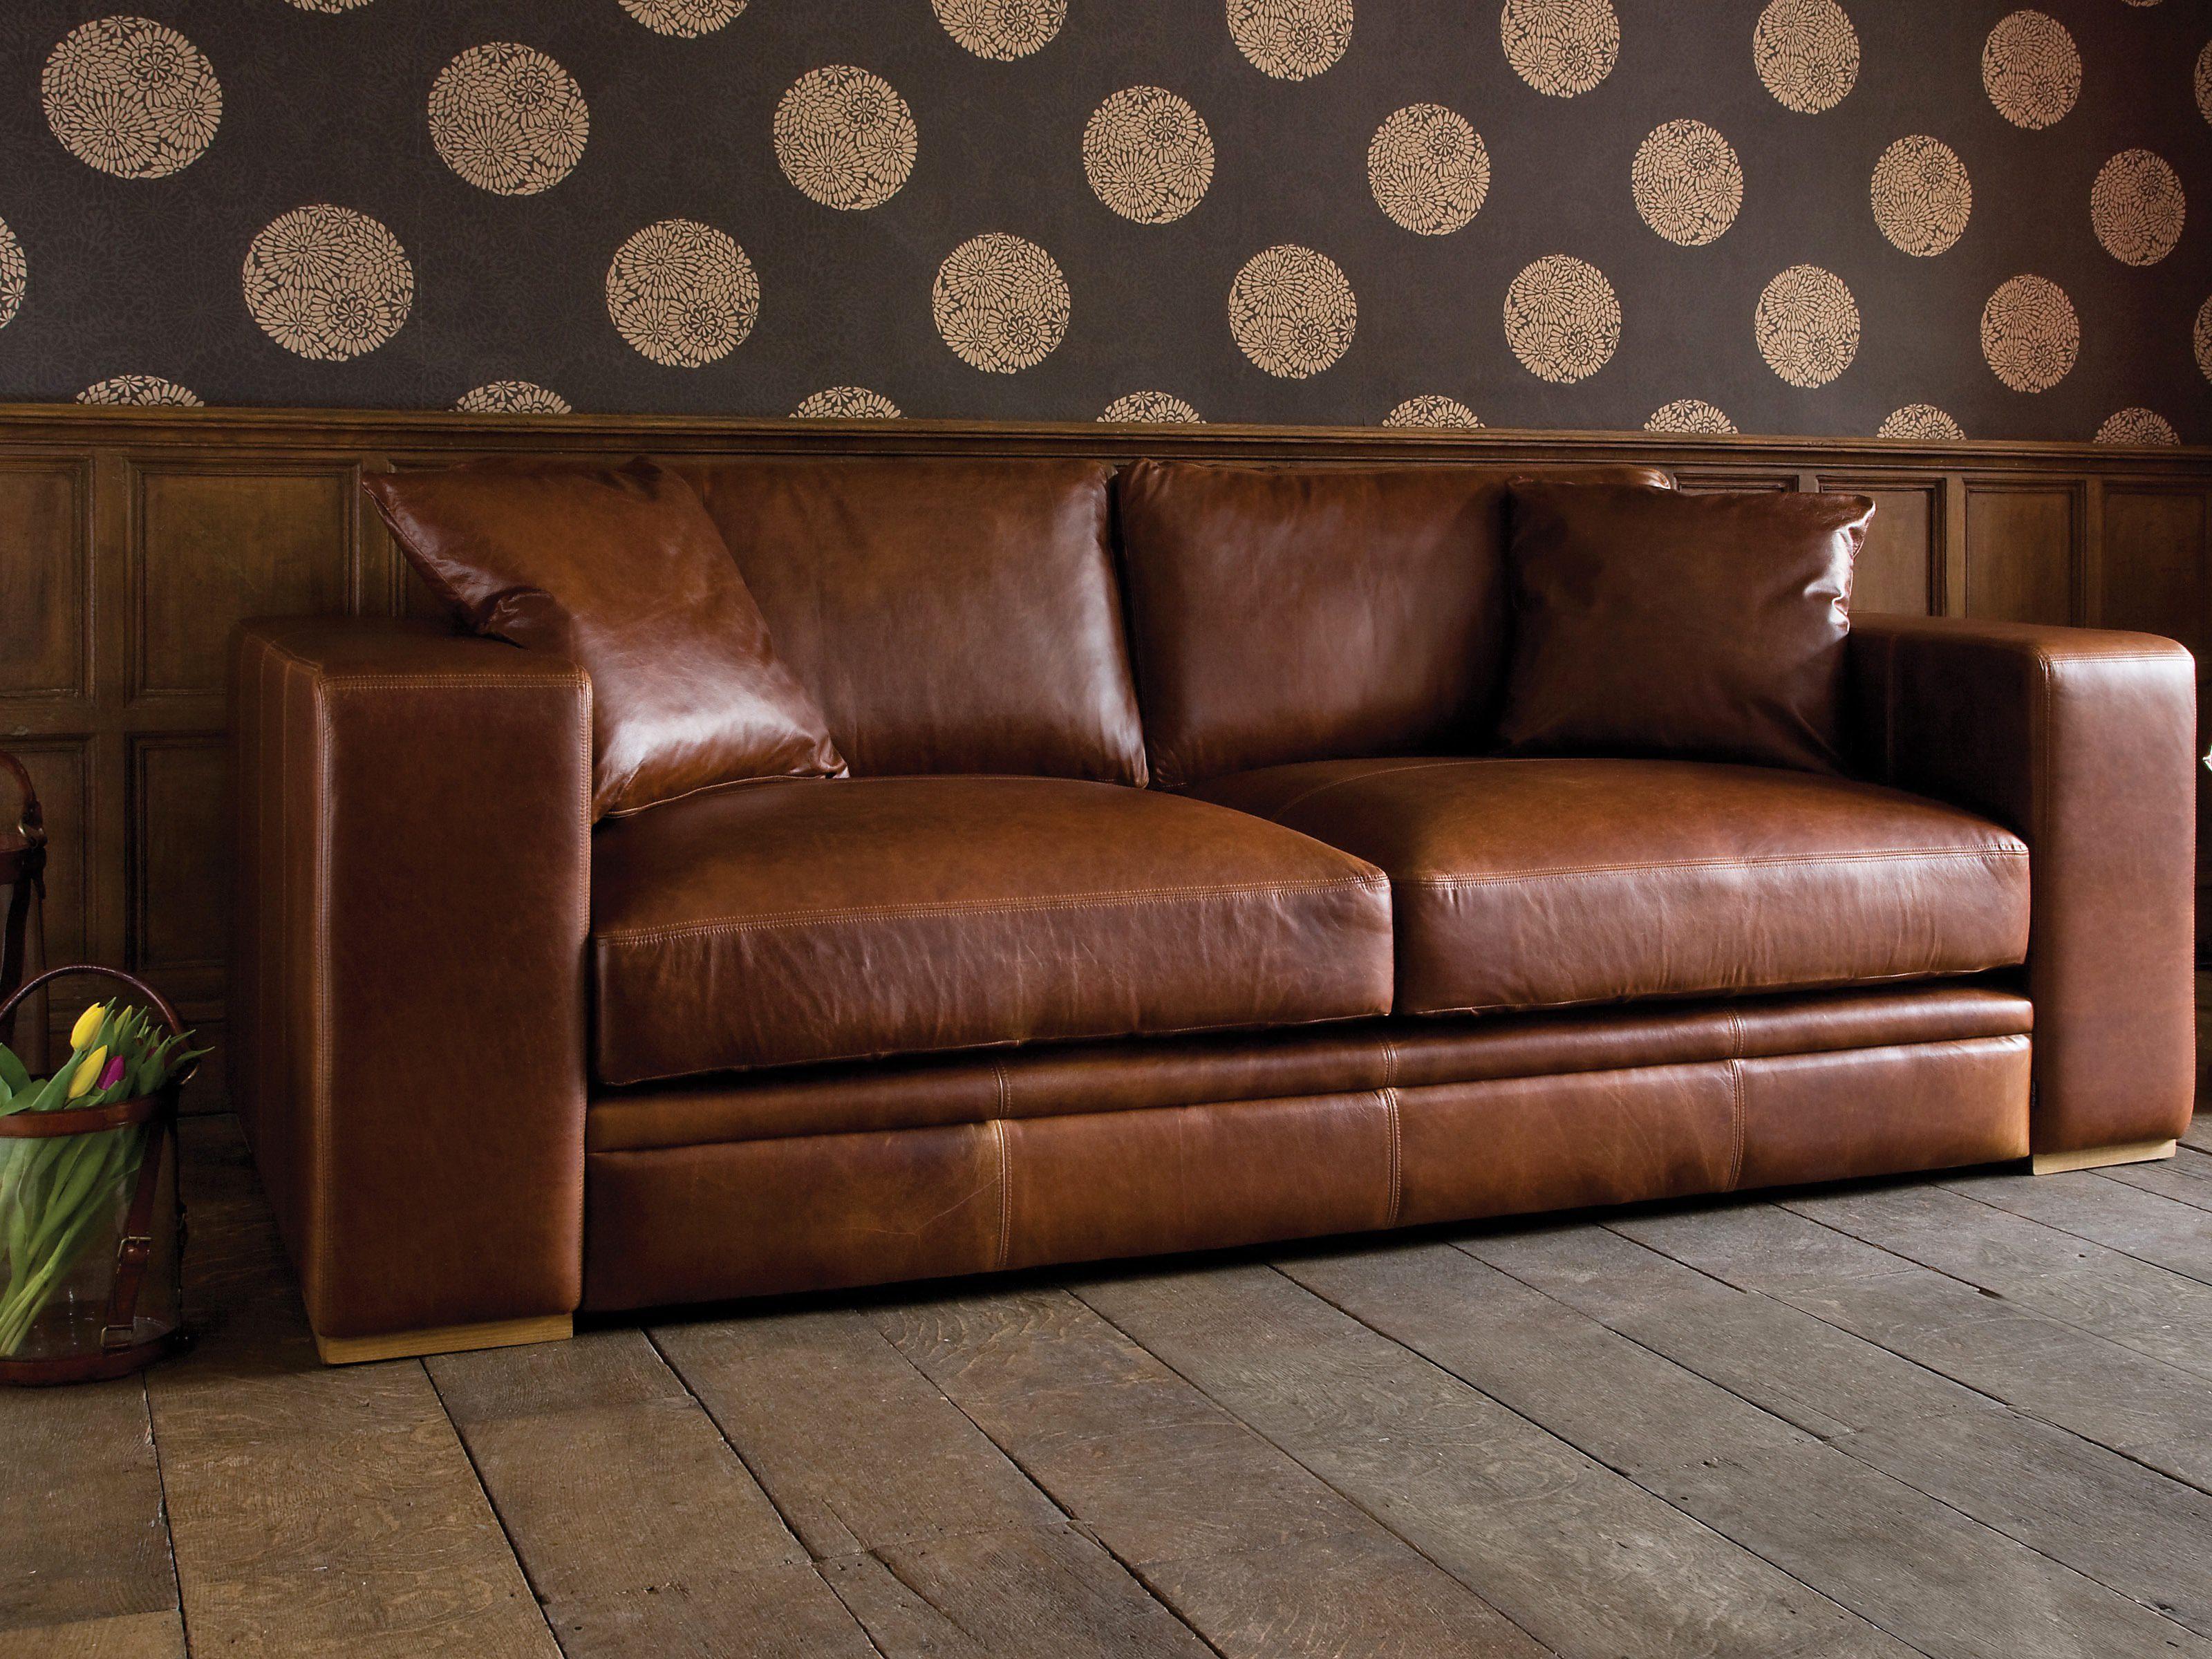 Furnishing Artificial Leather Manufacturer in Gurgaon & Delhi